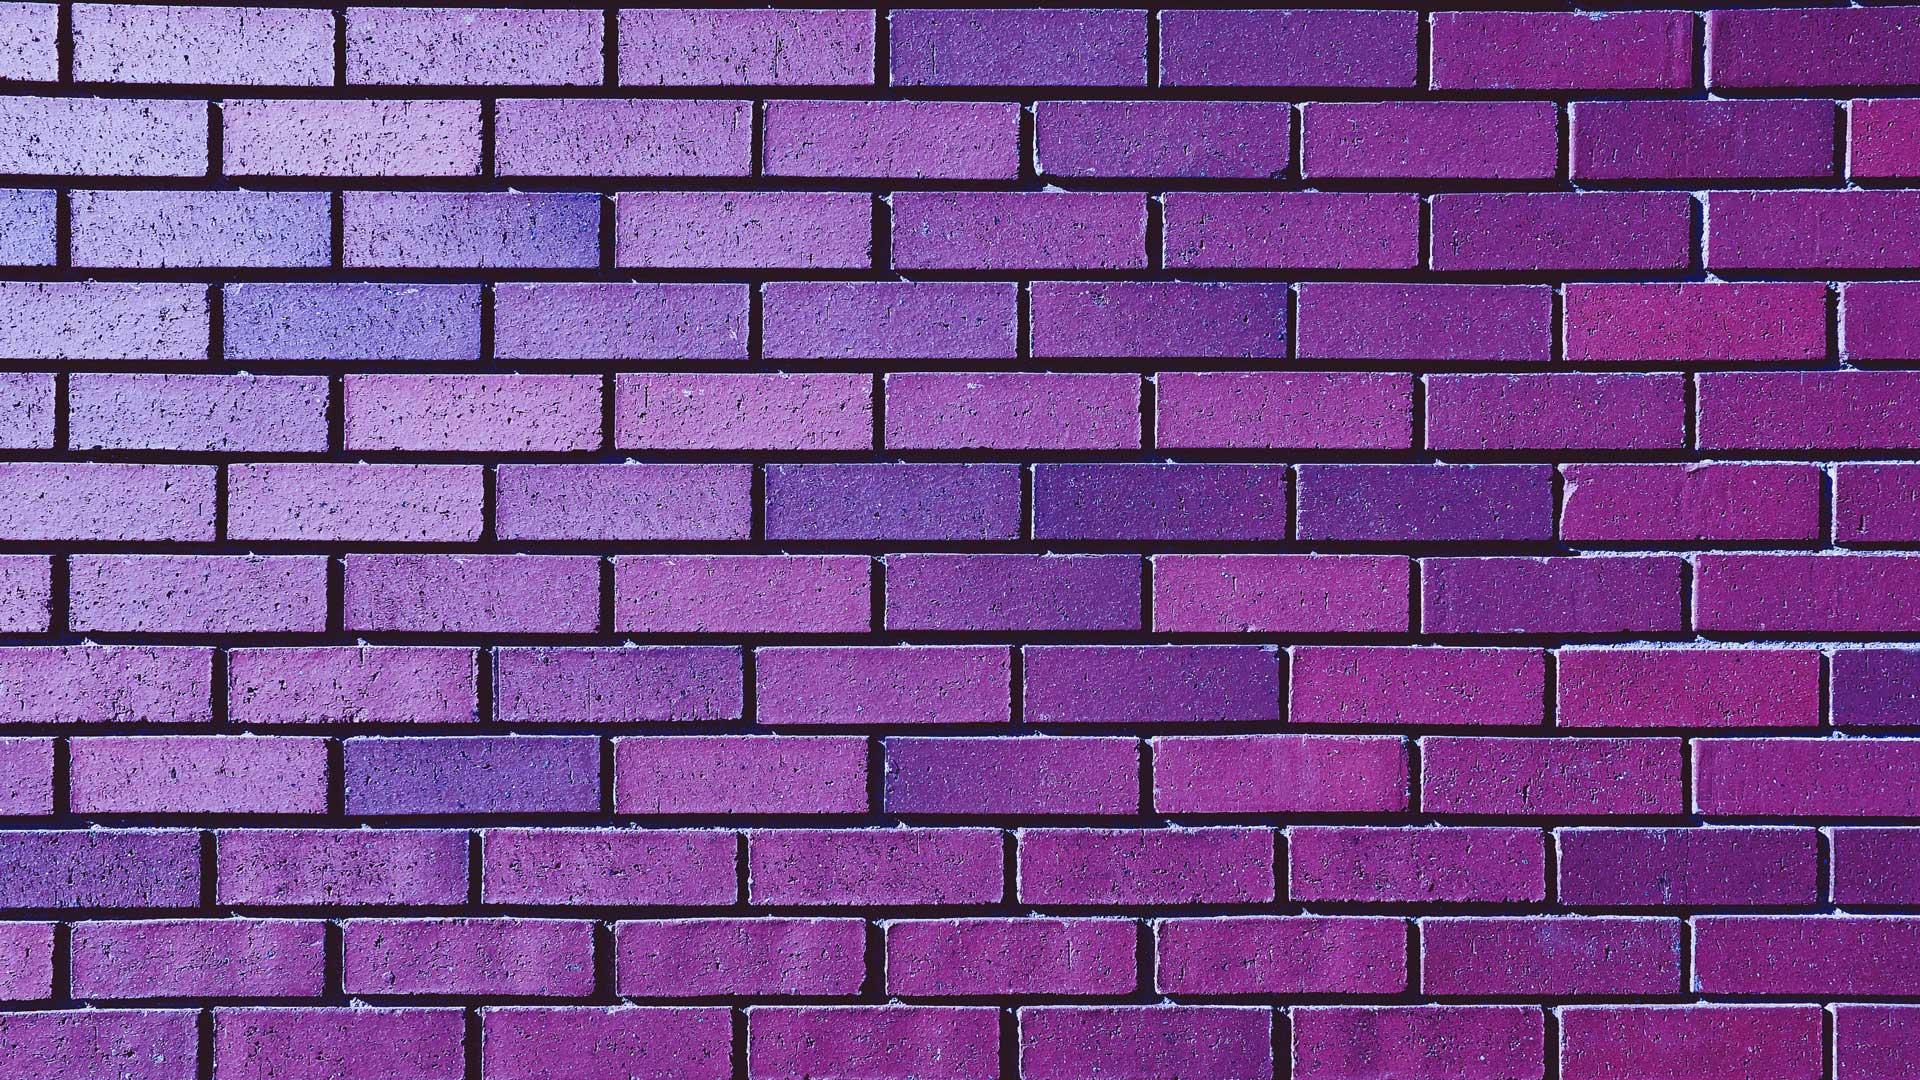 Brick Wall Security